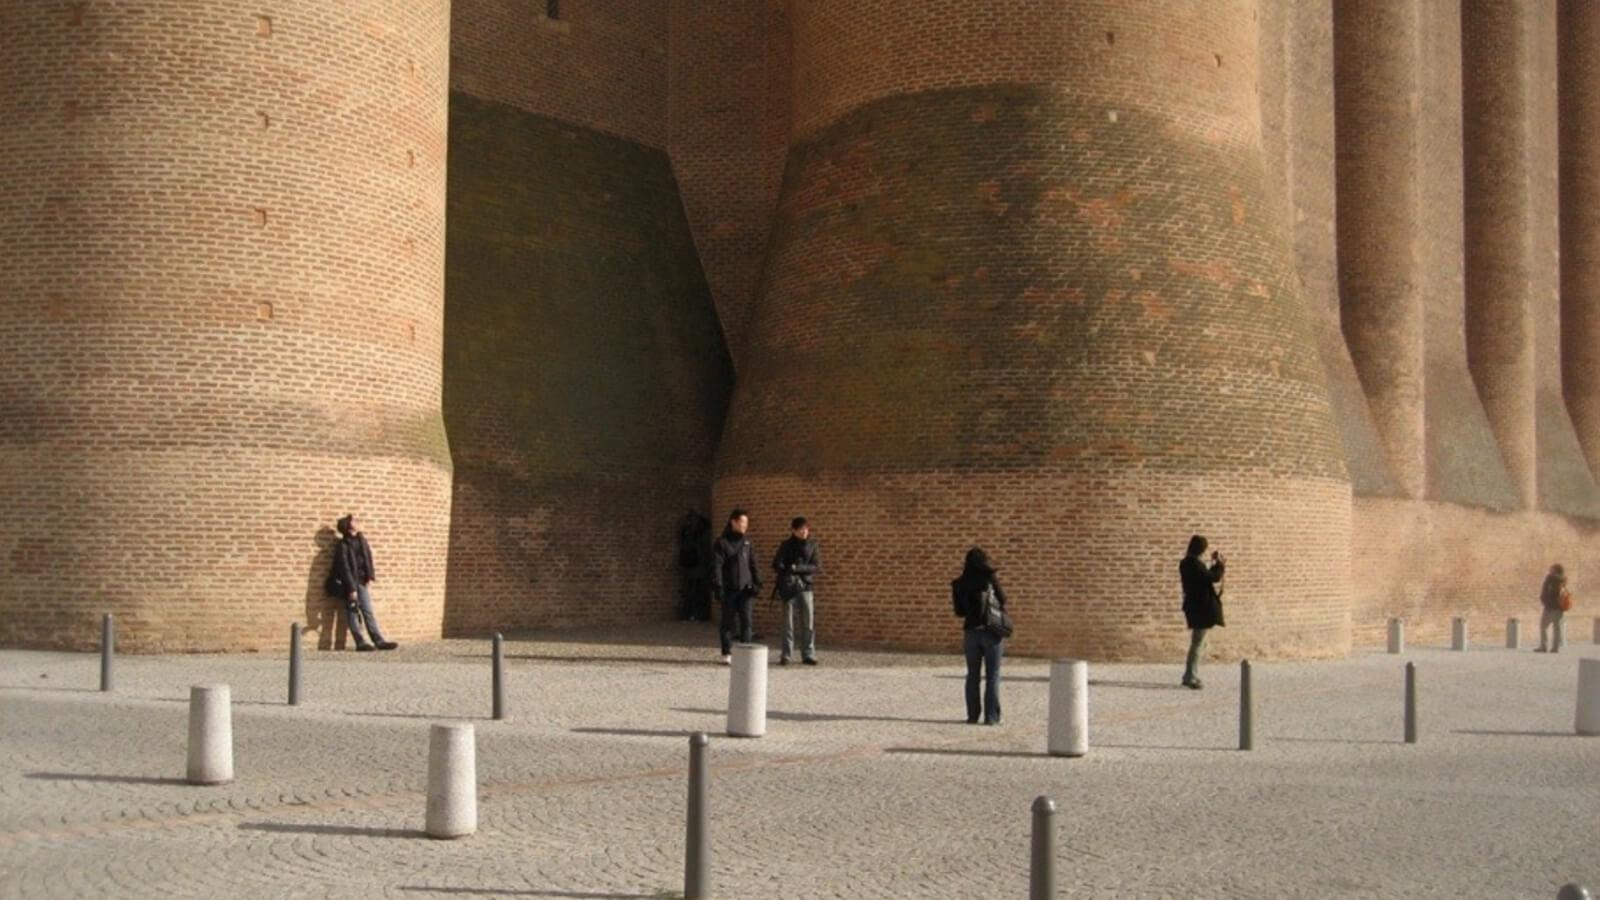 Llega la 16a muestra Internacional de Arquitectura de la Bienal de Venecia